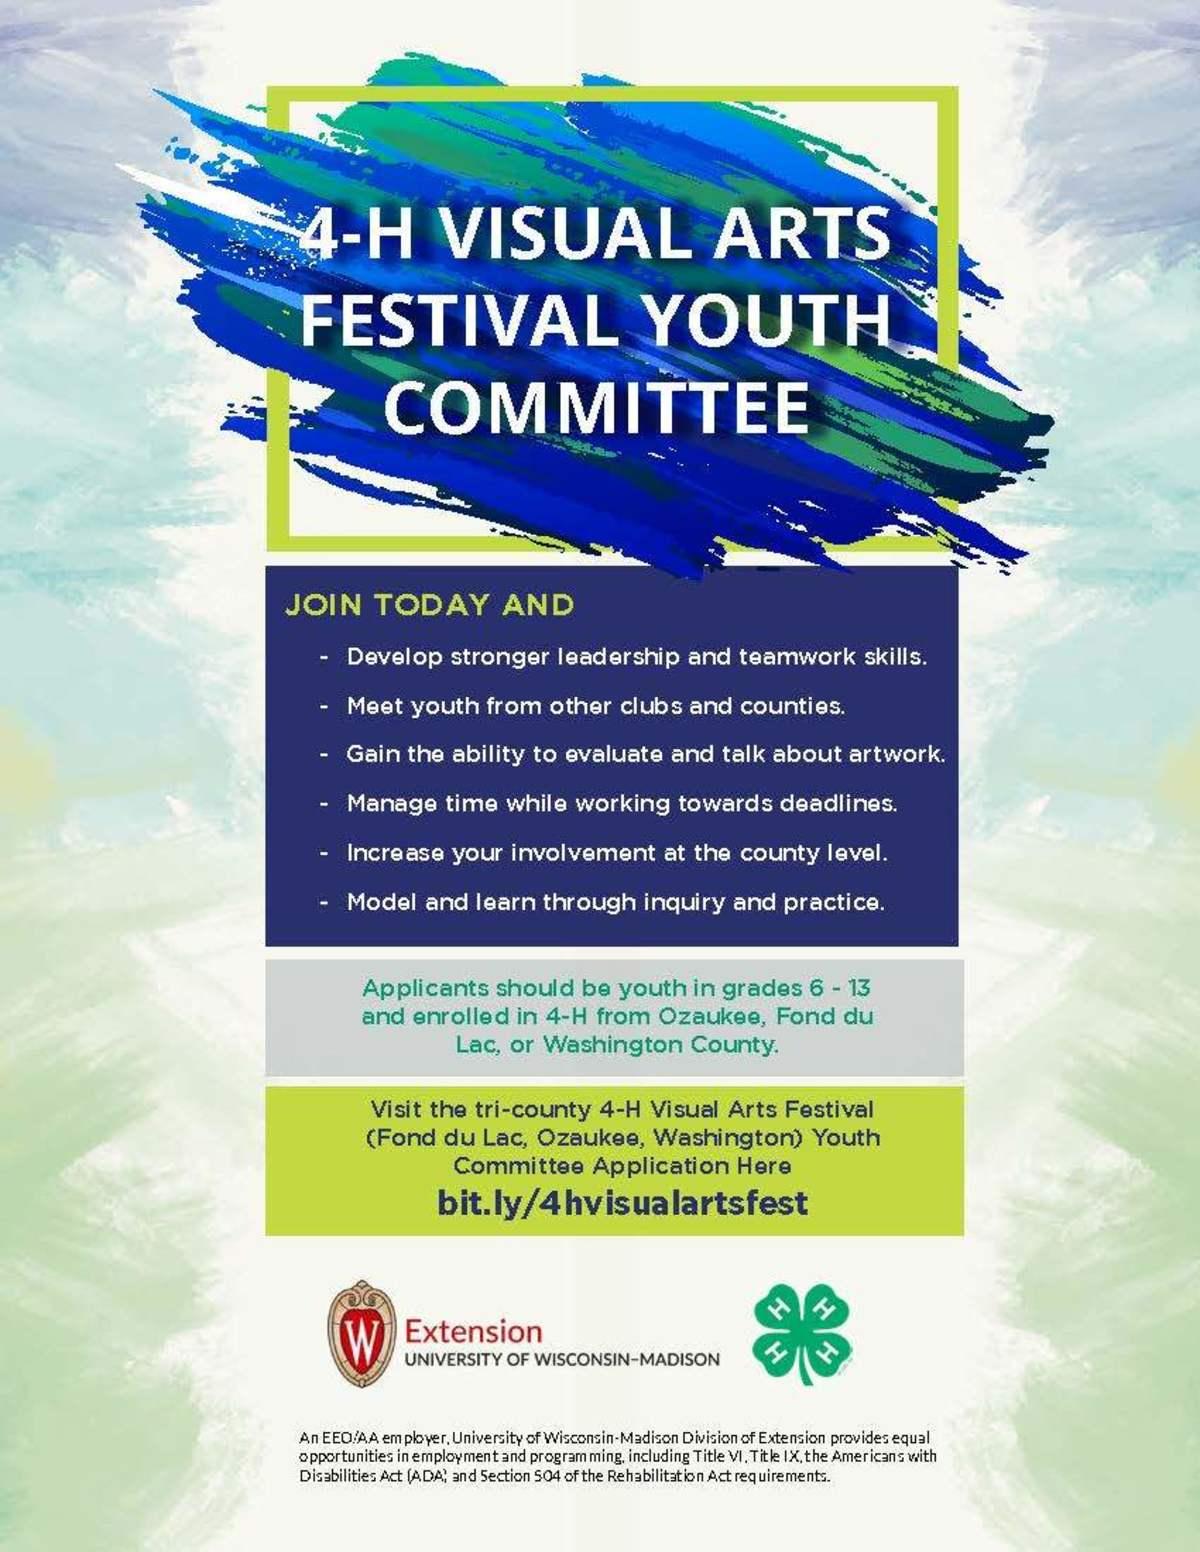 4-H VISUAL ARTS FESTIVAL CO